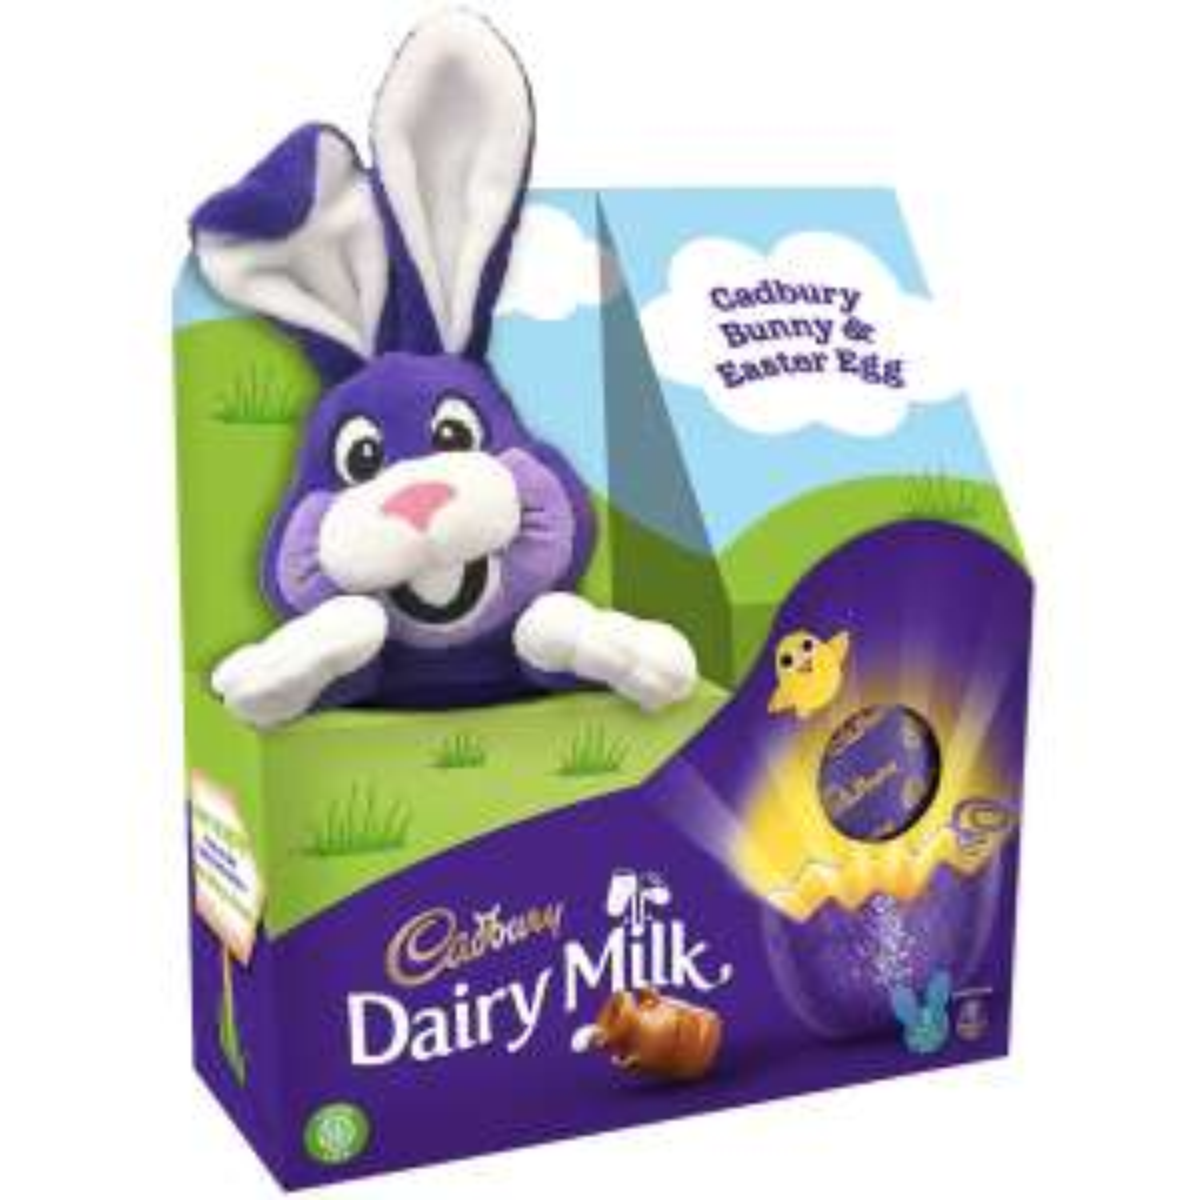 Cadbury Dairy Milk Bunny Easter Egg with Plush Bunny Toy £4.50 @ Sainsburys